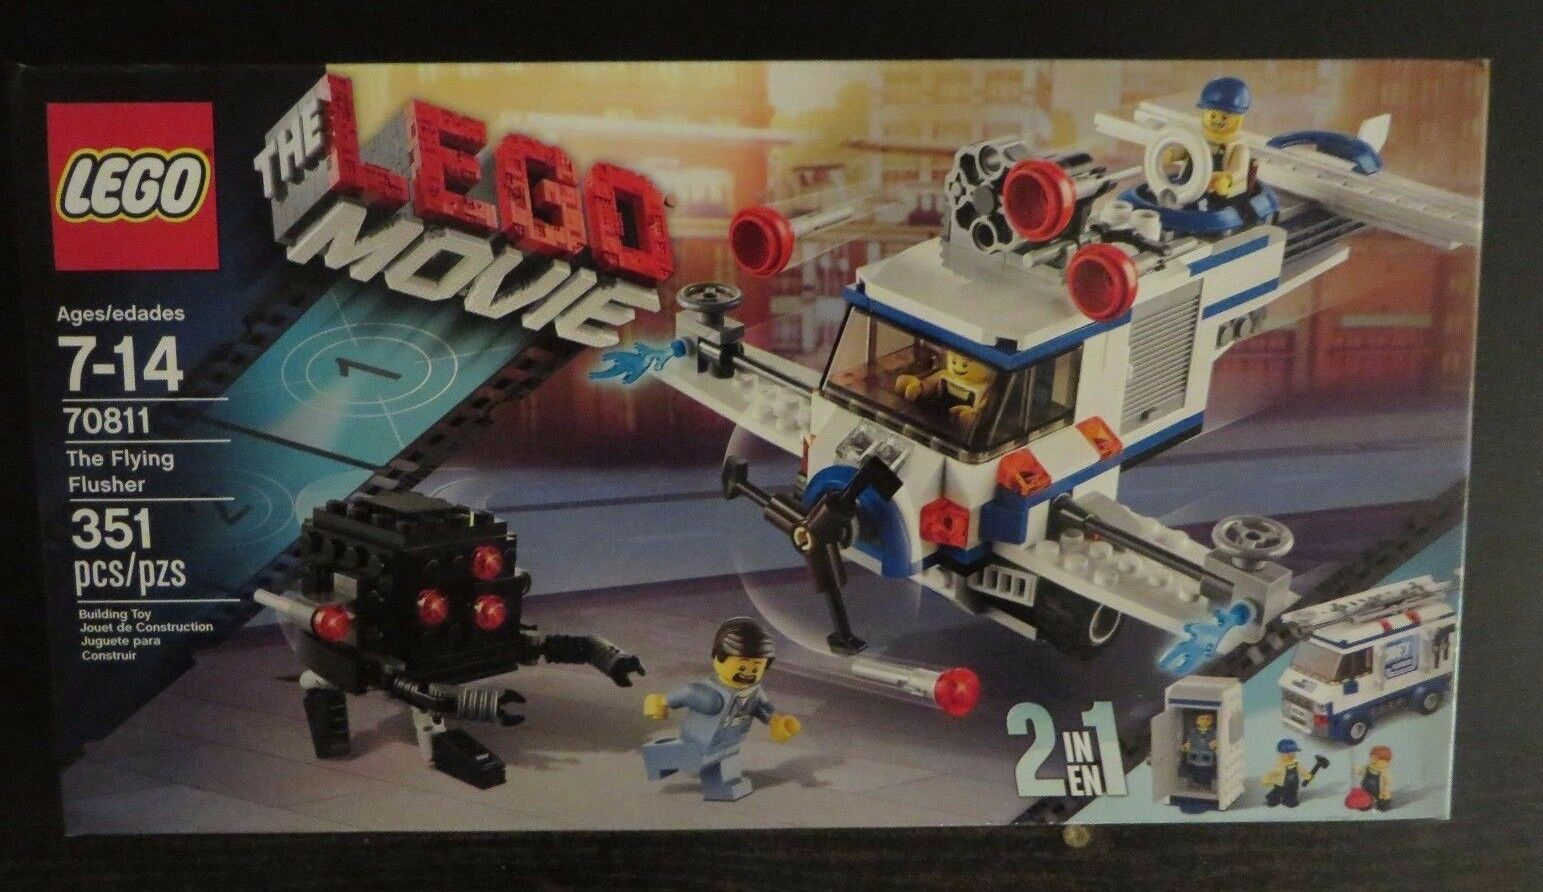 Lego 70811 - Lego Movie - The Flying Flusher - Retired - NISB